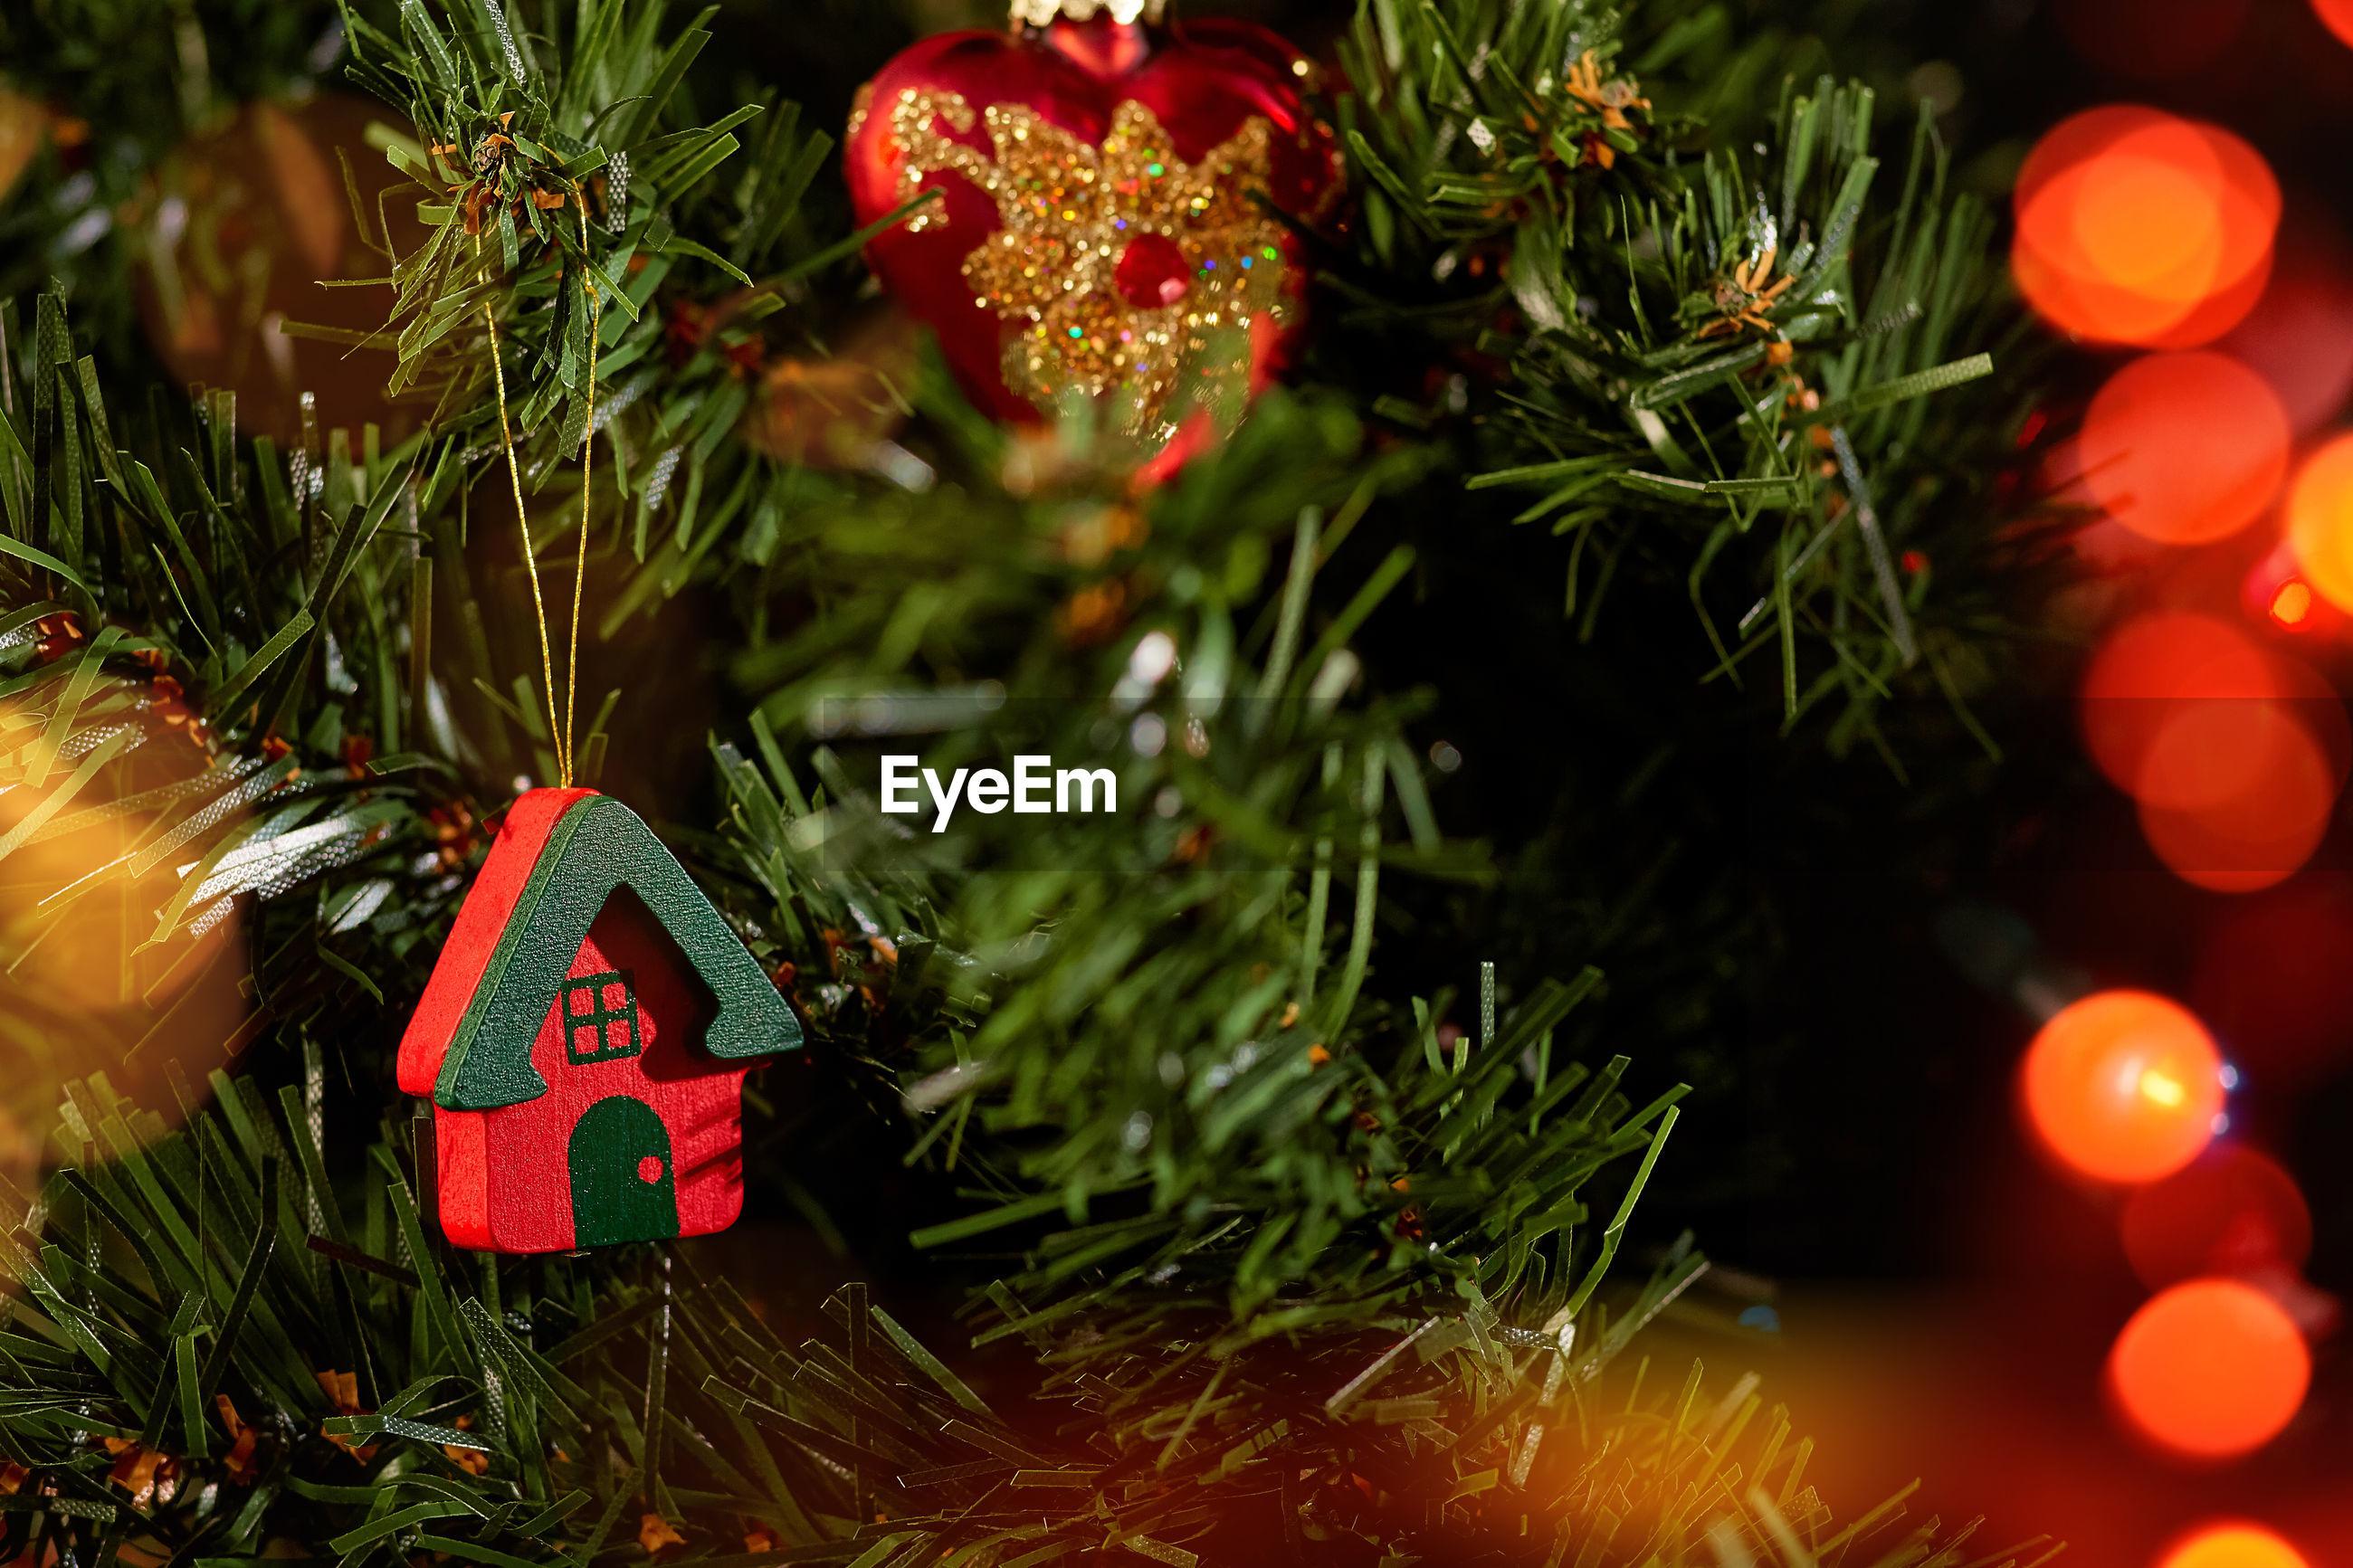 CLOSE-UP OF ILLUMINATED CHRISTMAS TREE ON BRANCH